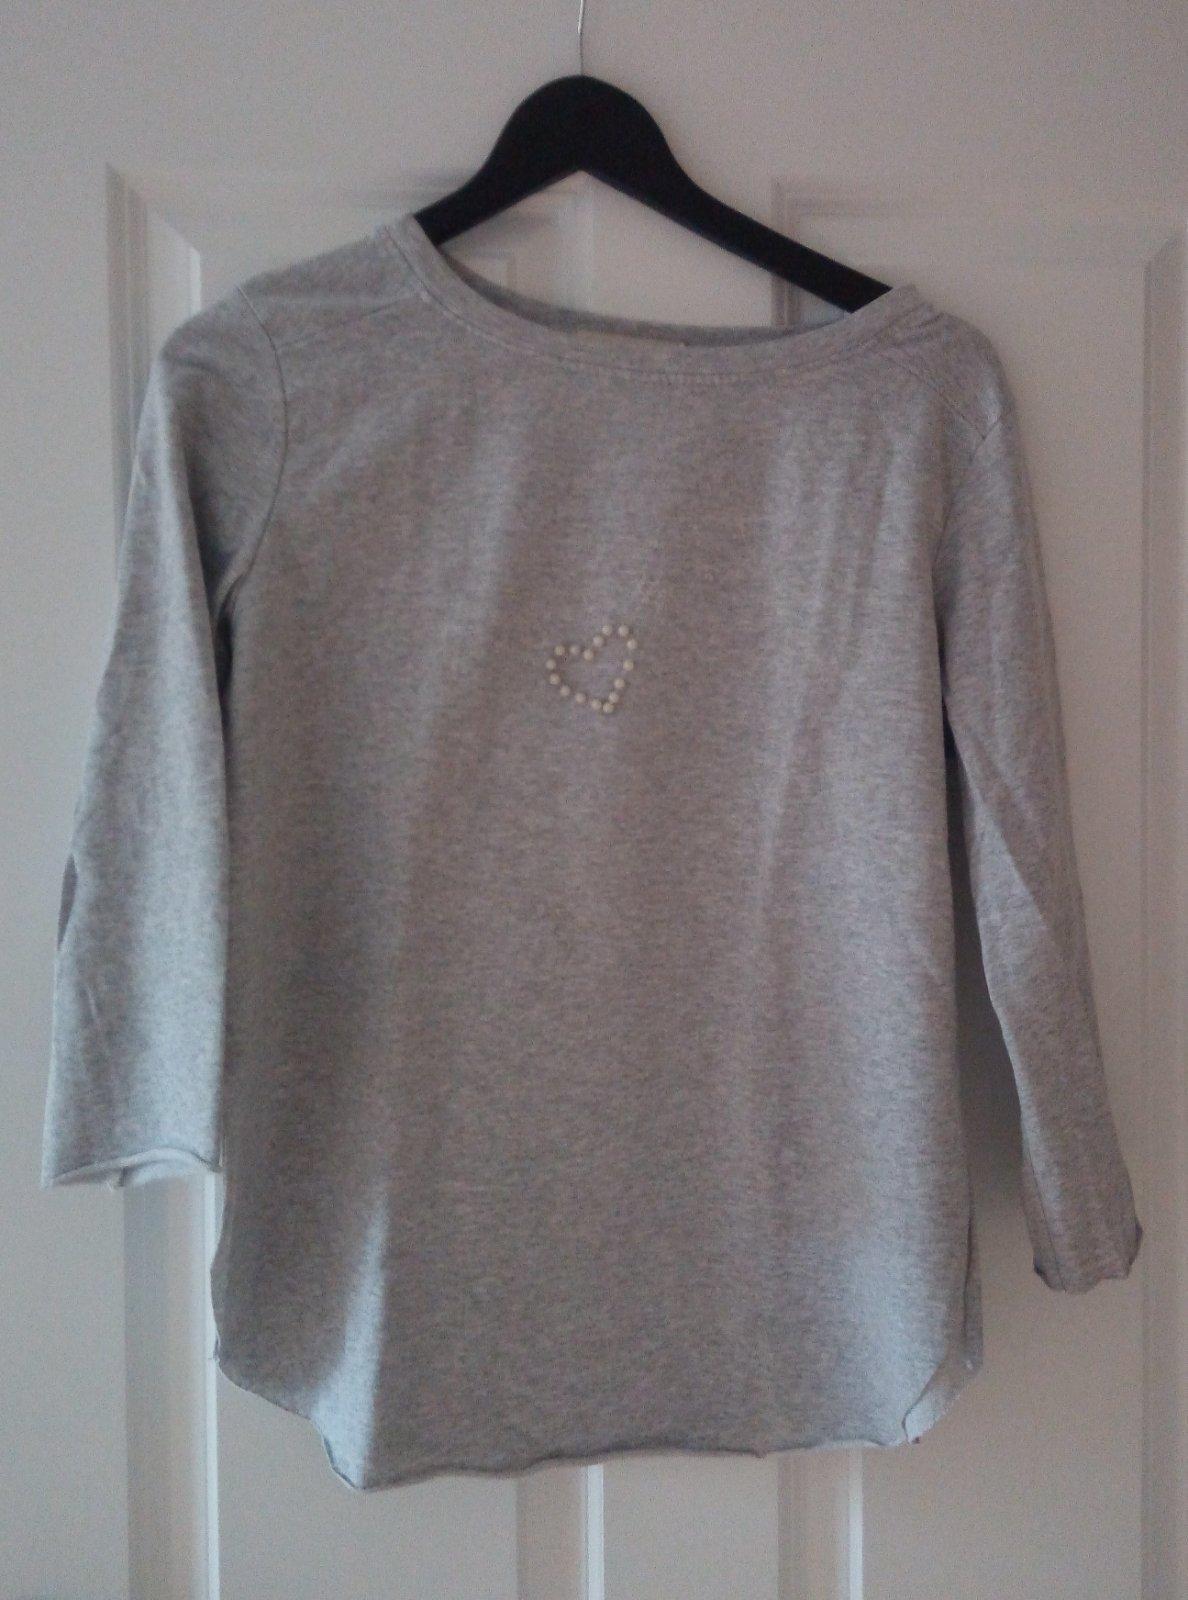 Sivá mikina/tričko S/M - Obrázok č. 1